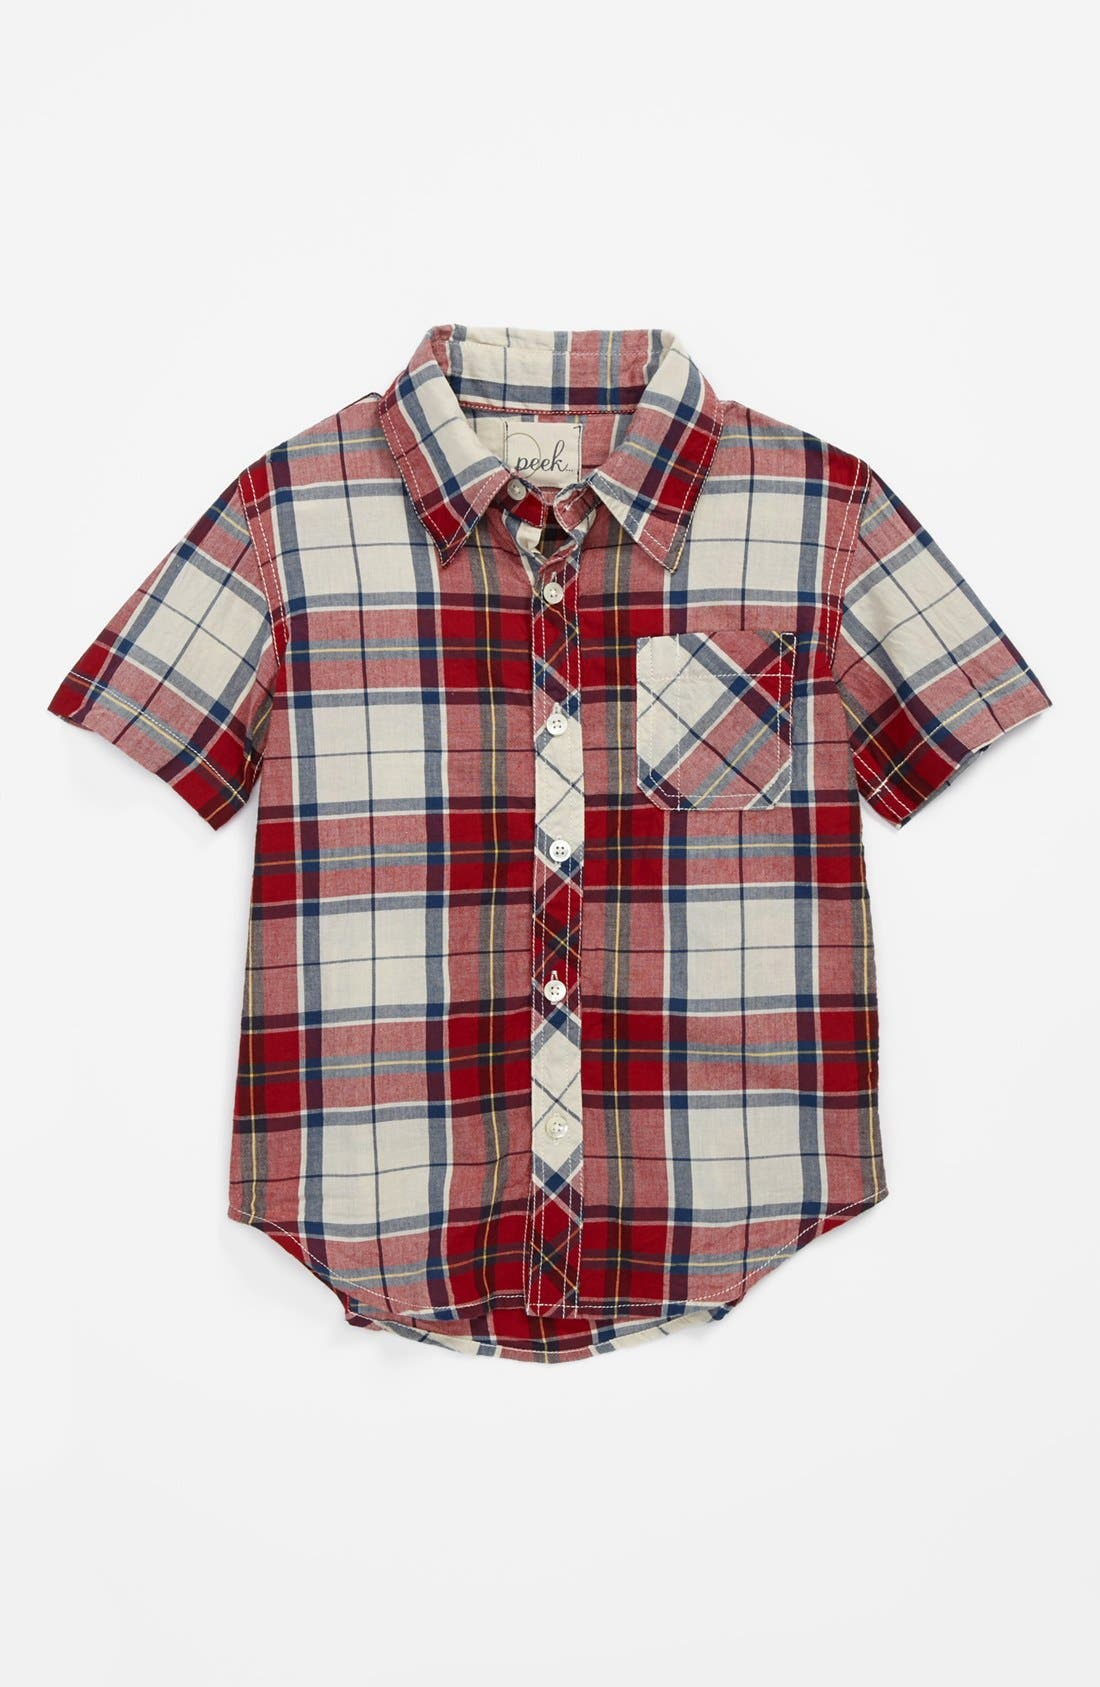 Alternate Image 1 Selected - Peek 'Baxter Plaid' Short Sleeve Sport Shirt (Toddler Boys, Little Boys & Big Boys)